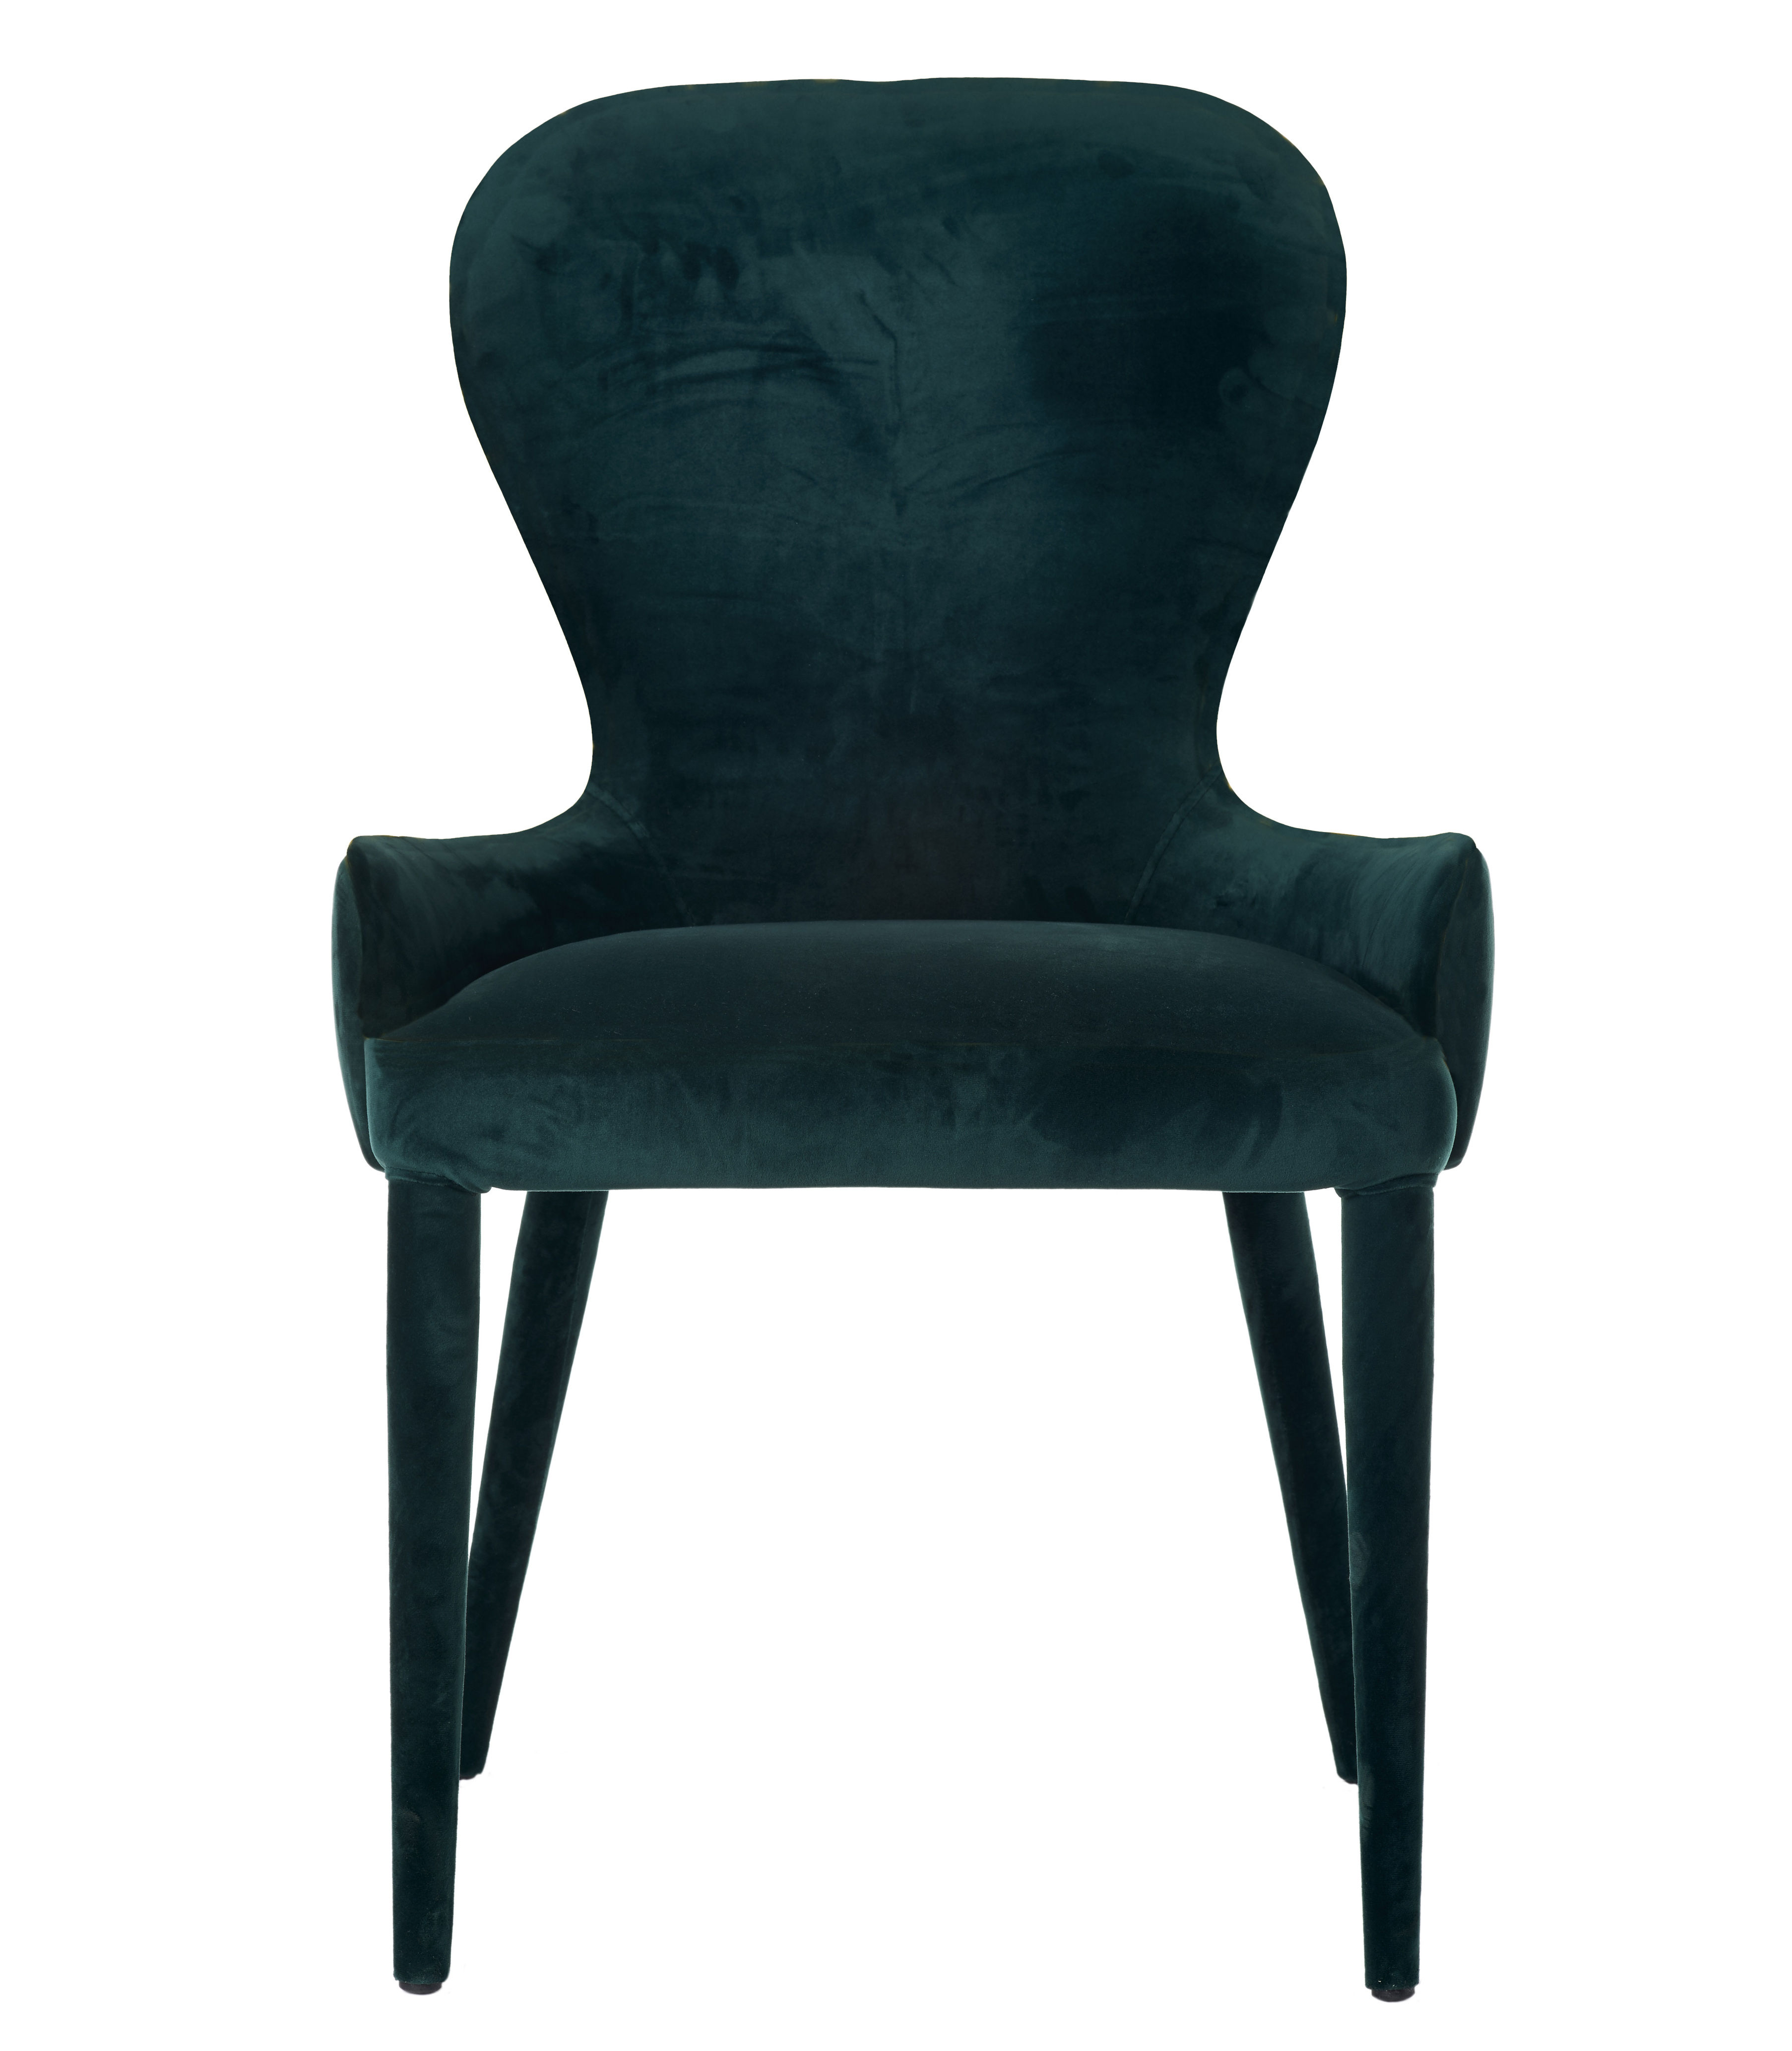 fauteuil rembourr aunty velours vert sapin pols potten made in design. Black Bedroom Furniture Sets. Home Design Ideas